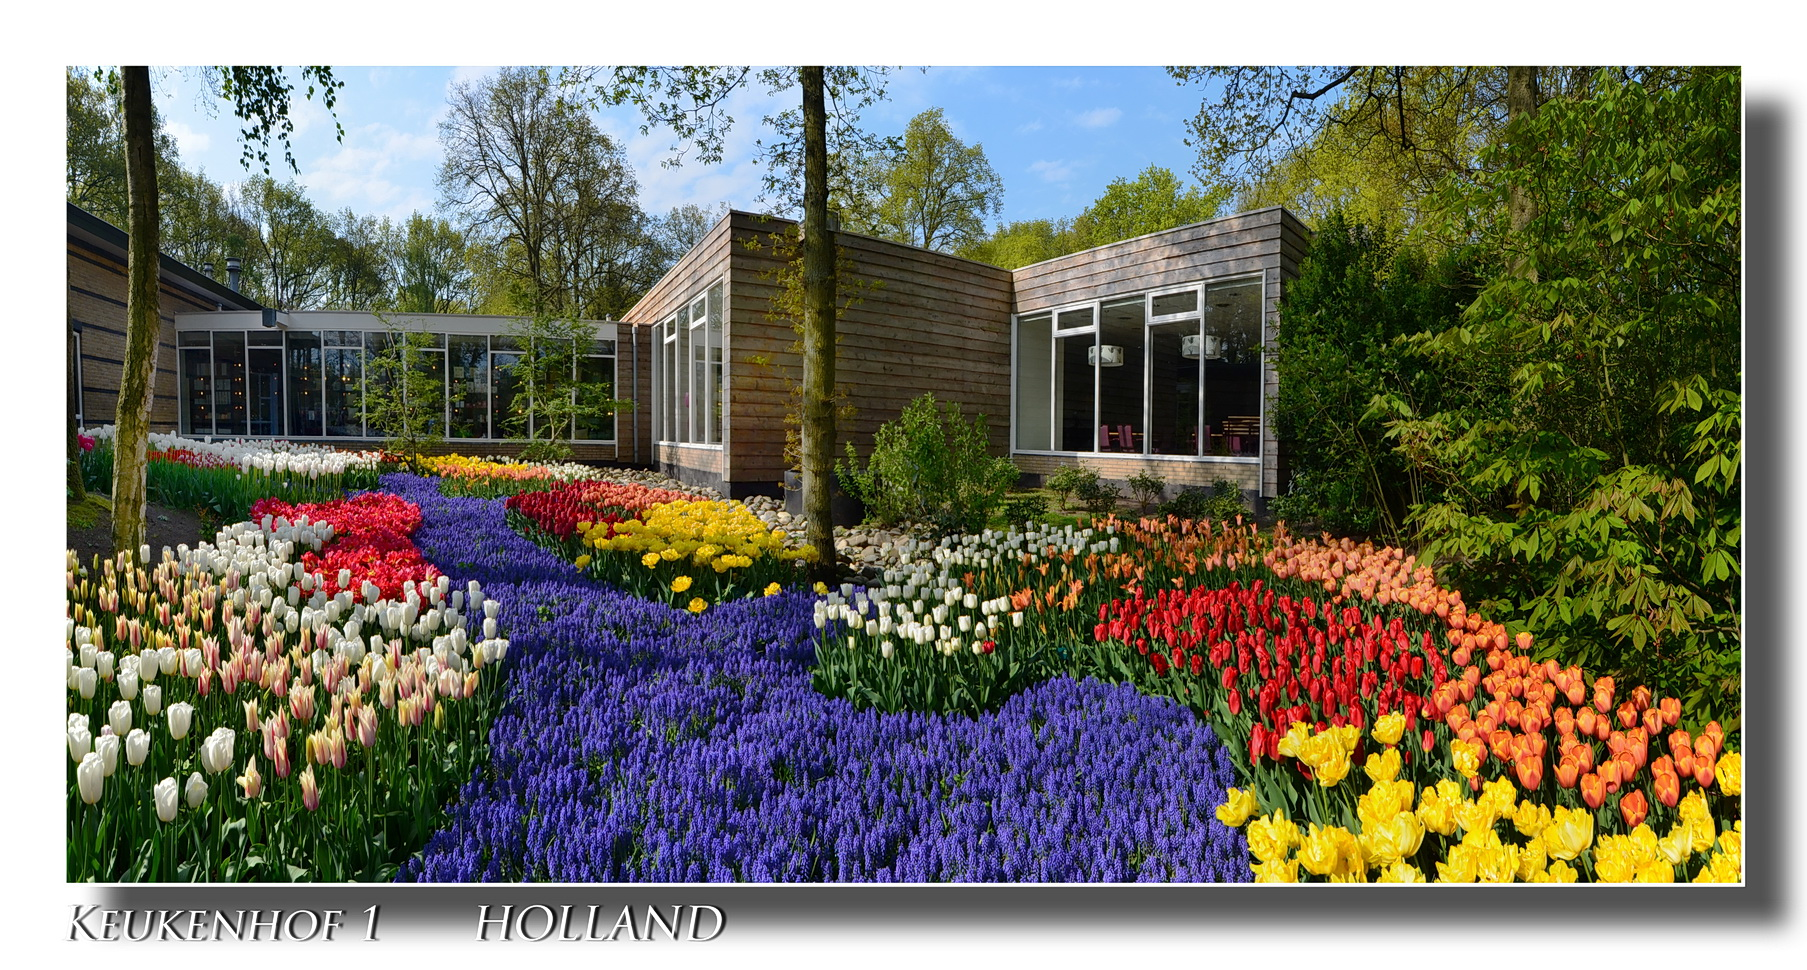 Keukenhof 1 HOLLAND